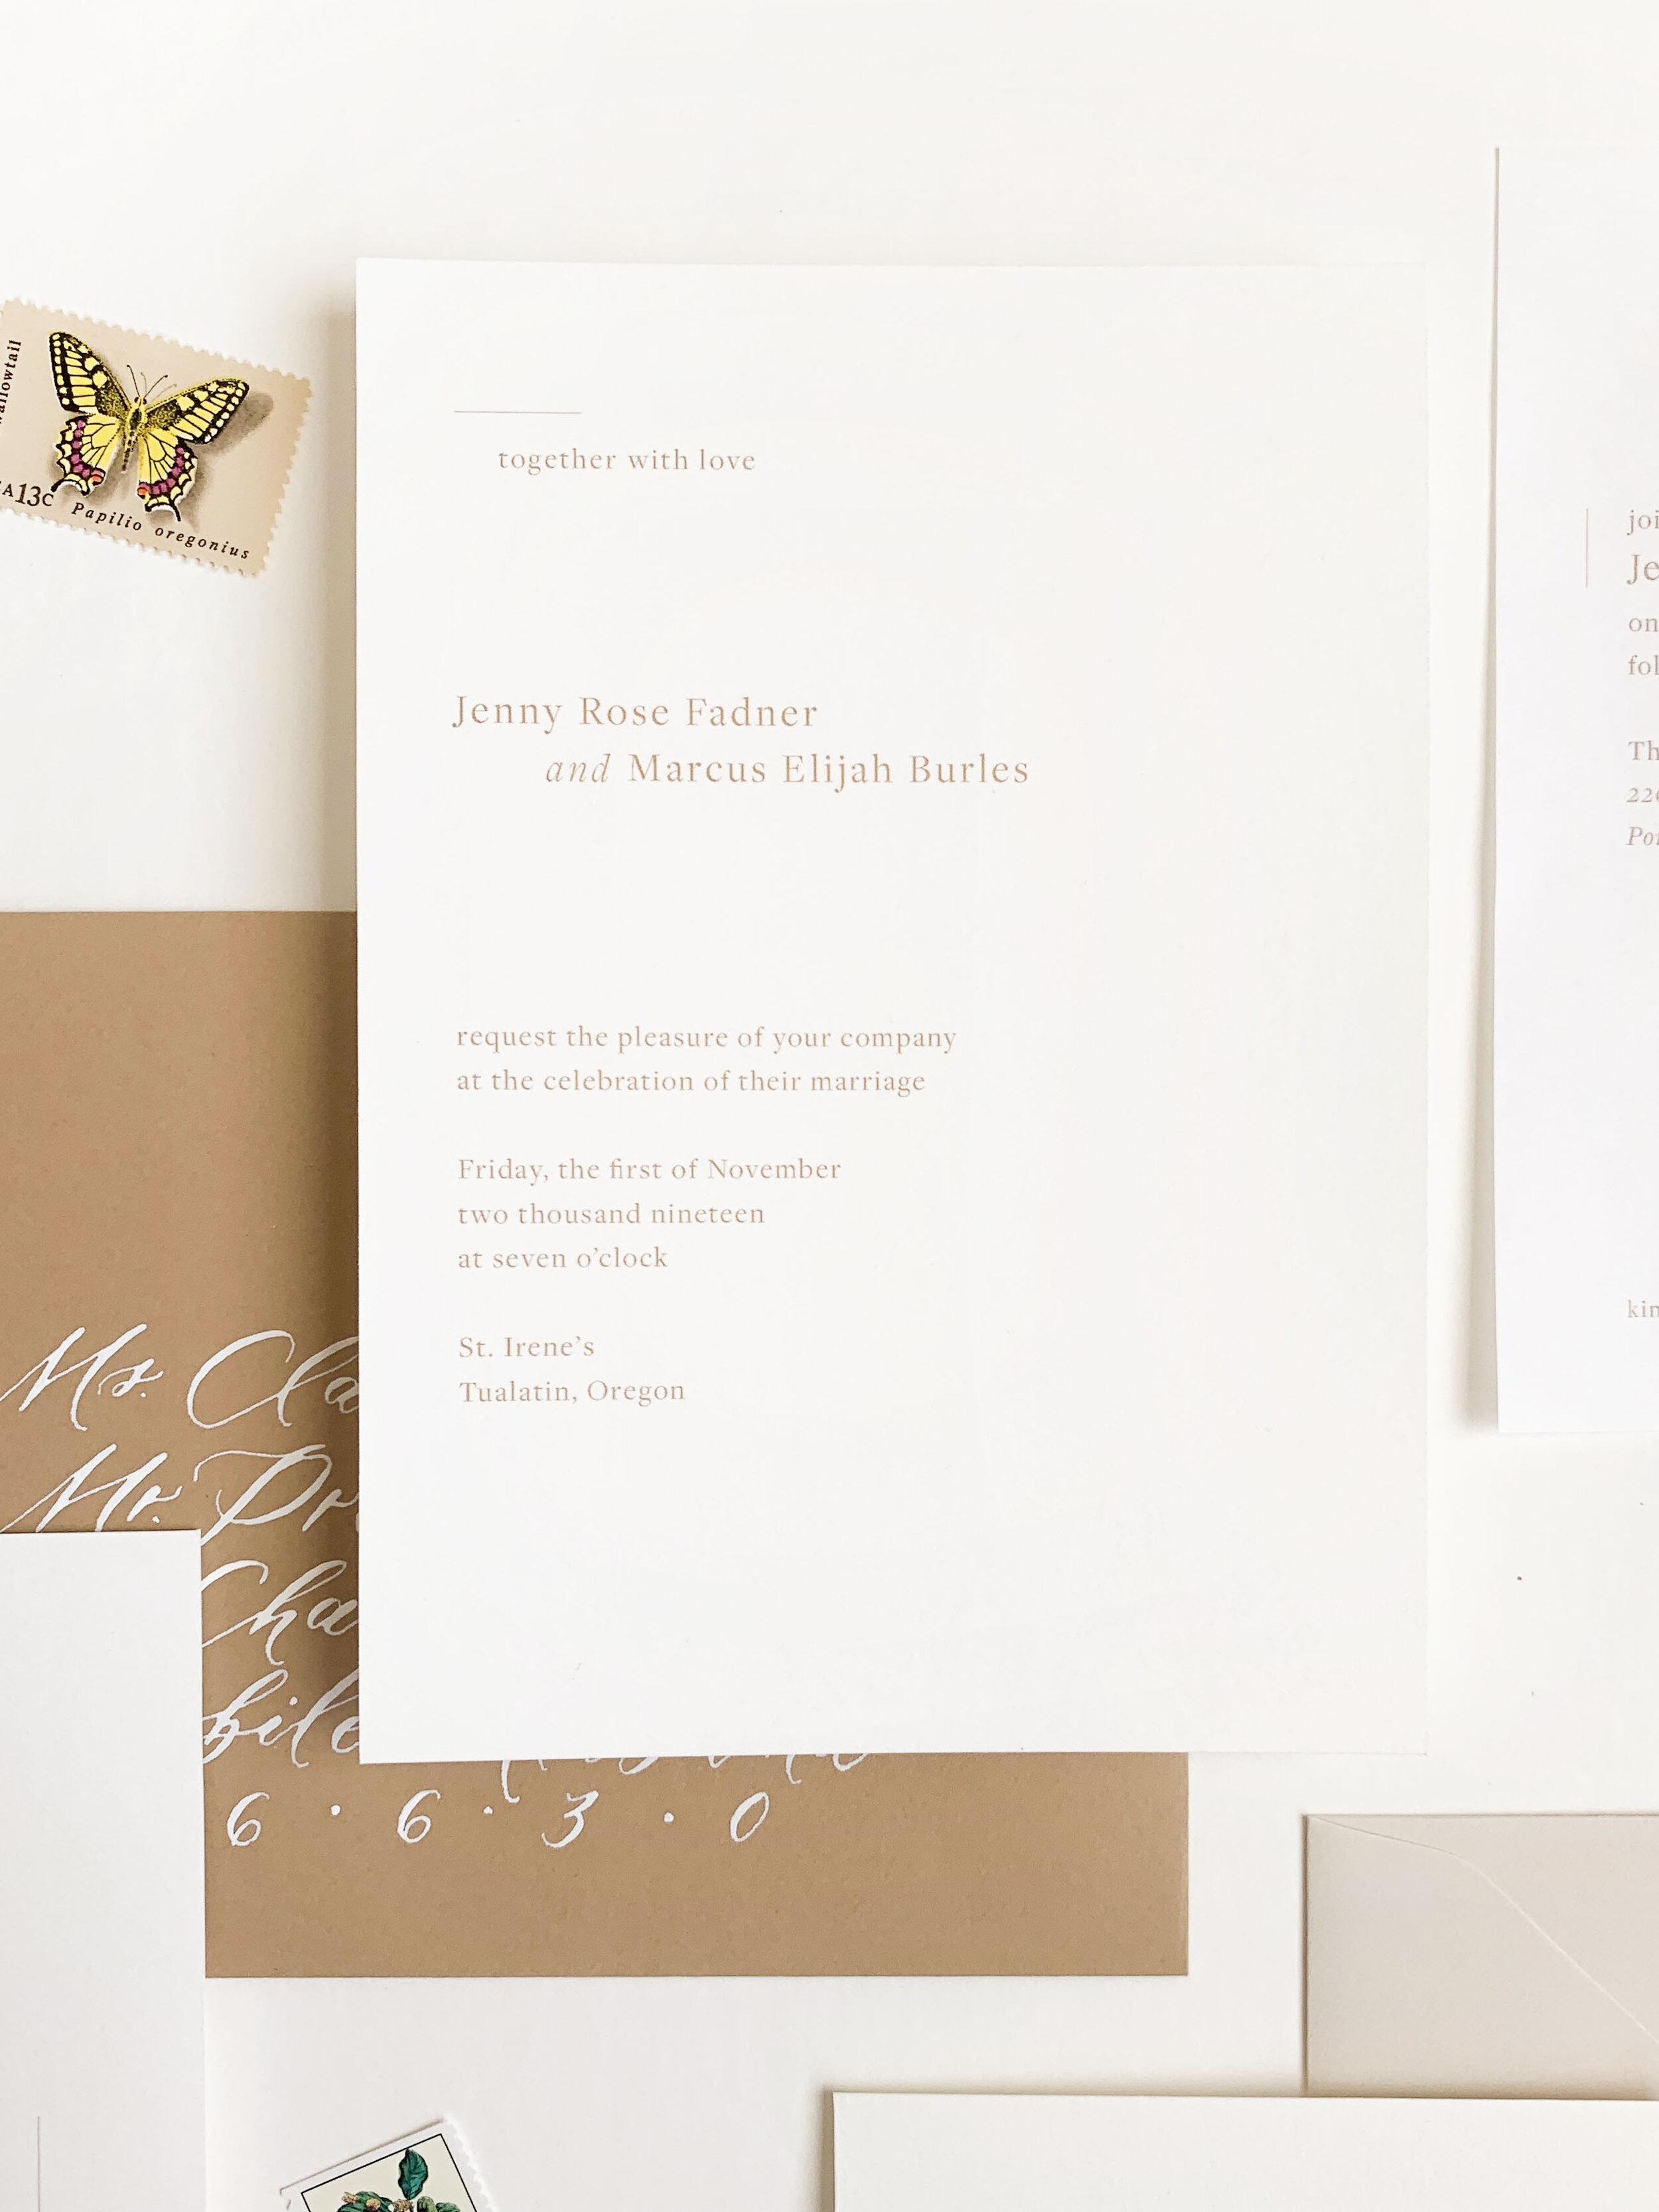 Minimalist refined wedding invitations. Clean and modern wedding invitations. Calligraphy addressing vellum wedding invitations.